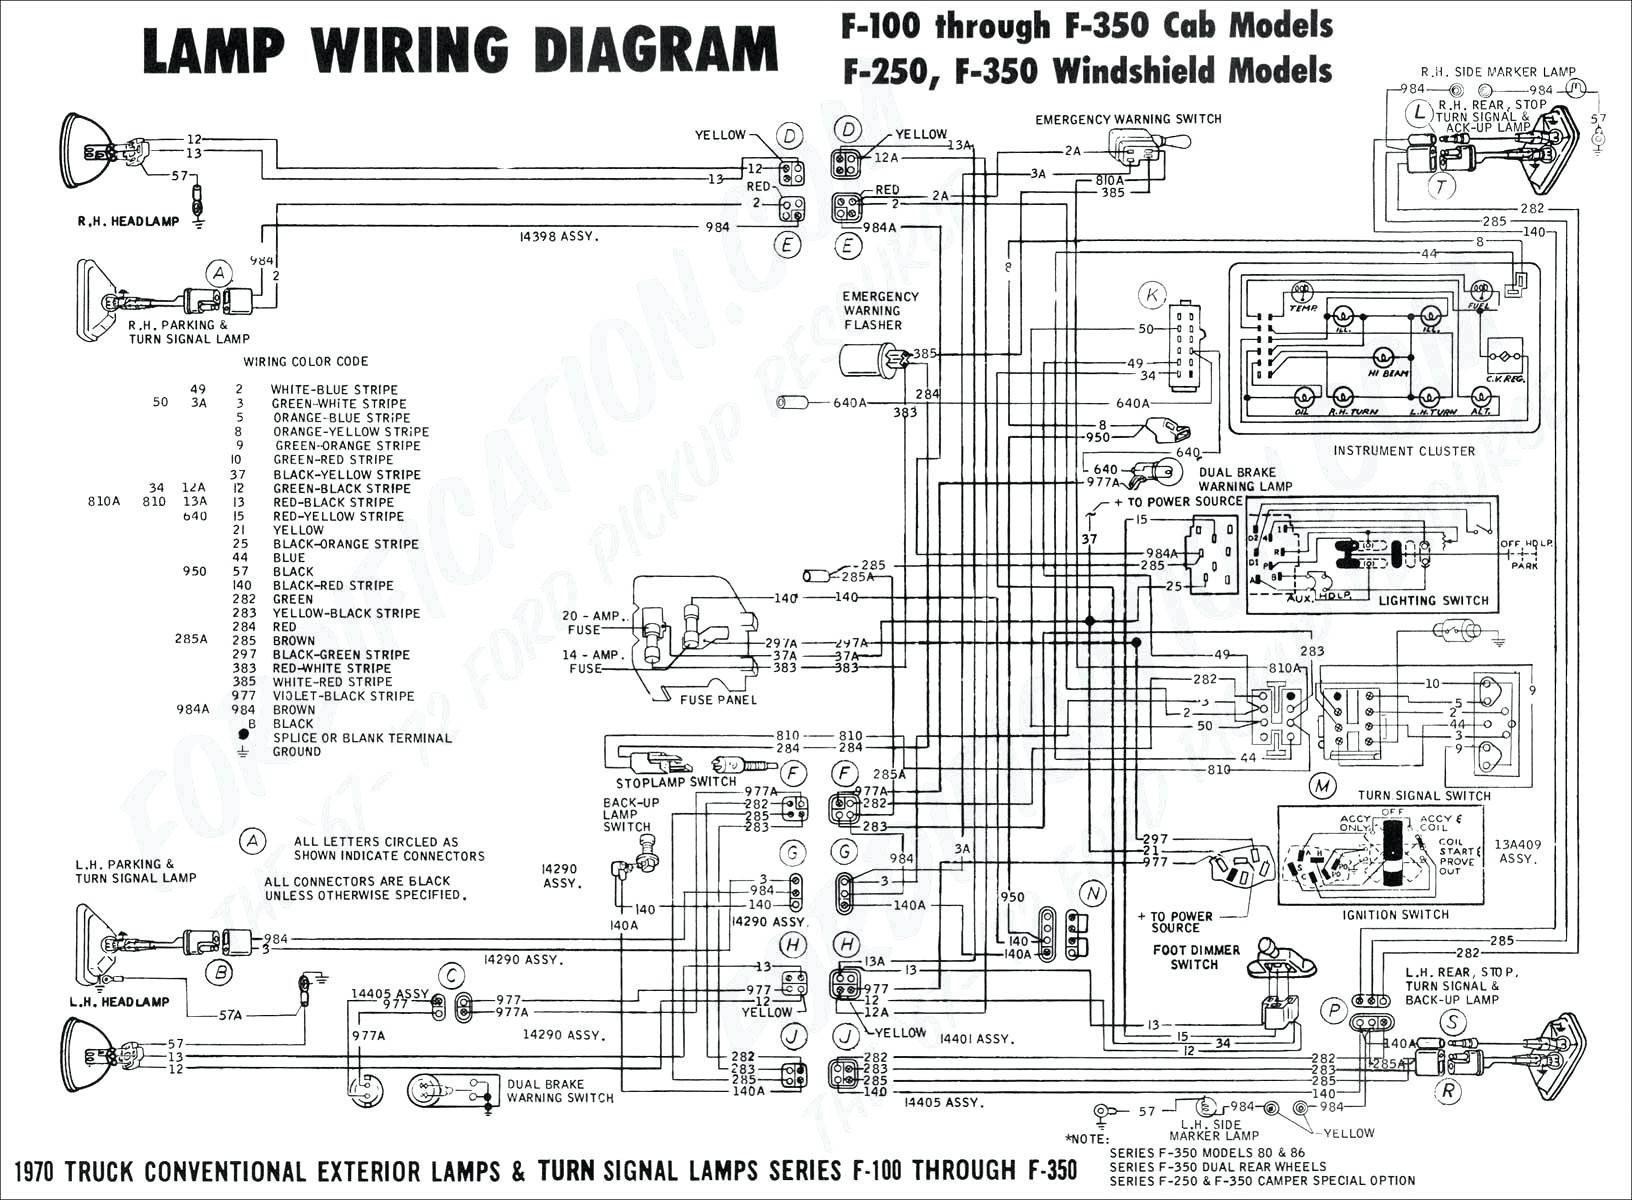 05 durango lighting wiring diagram enthusiast wiring diagrams u2022 rh rasalibre co 1999 Dodge Durango Wiring Schematics Dodge Durango Window Wiring Diagram